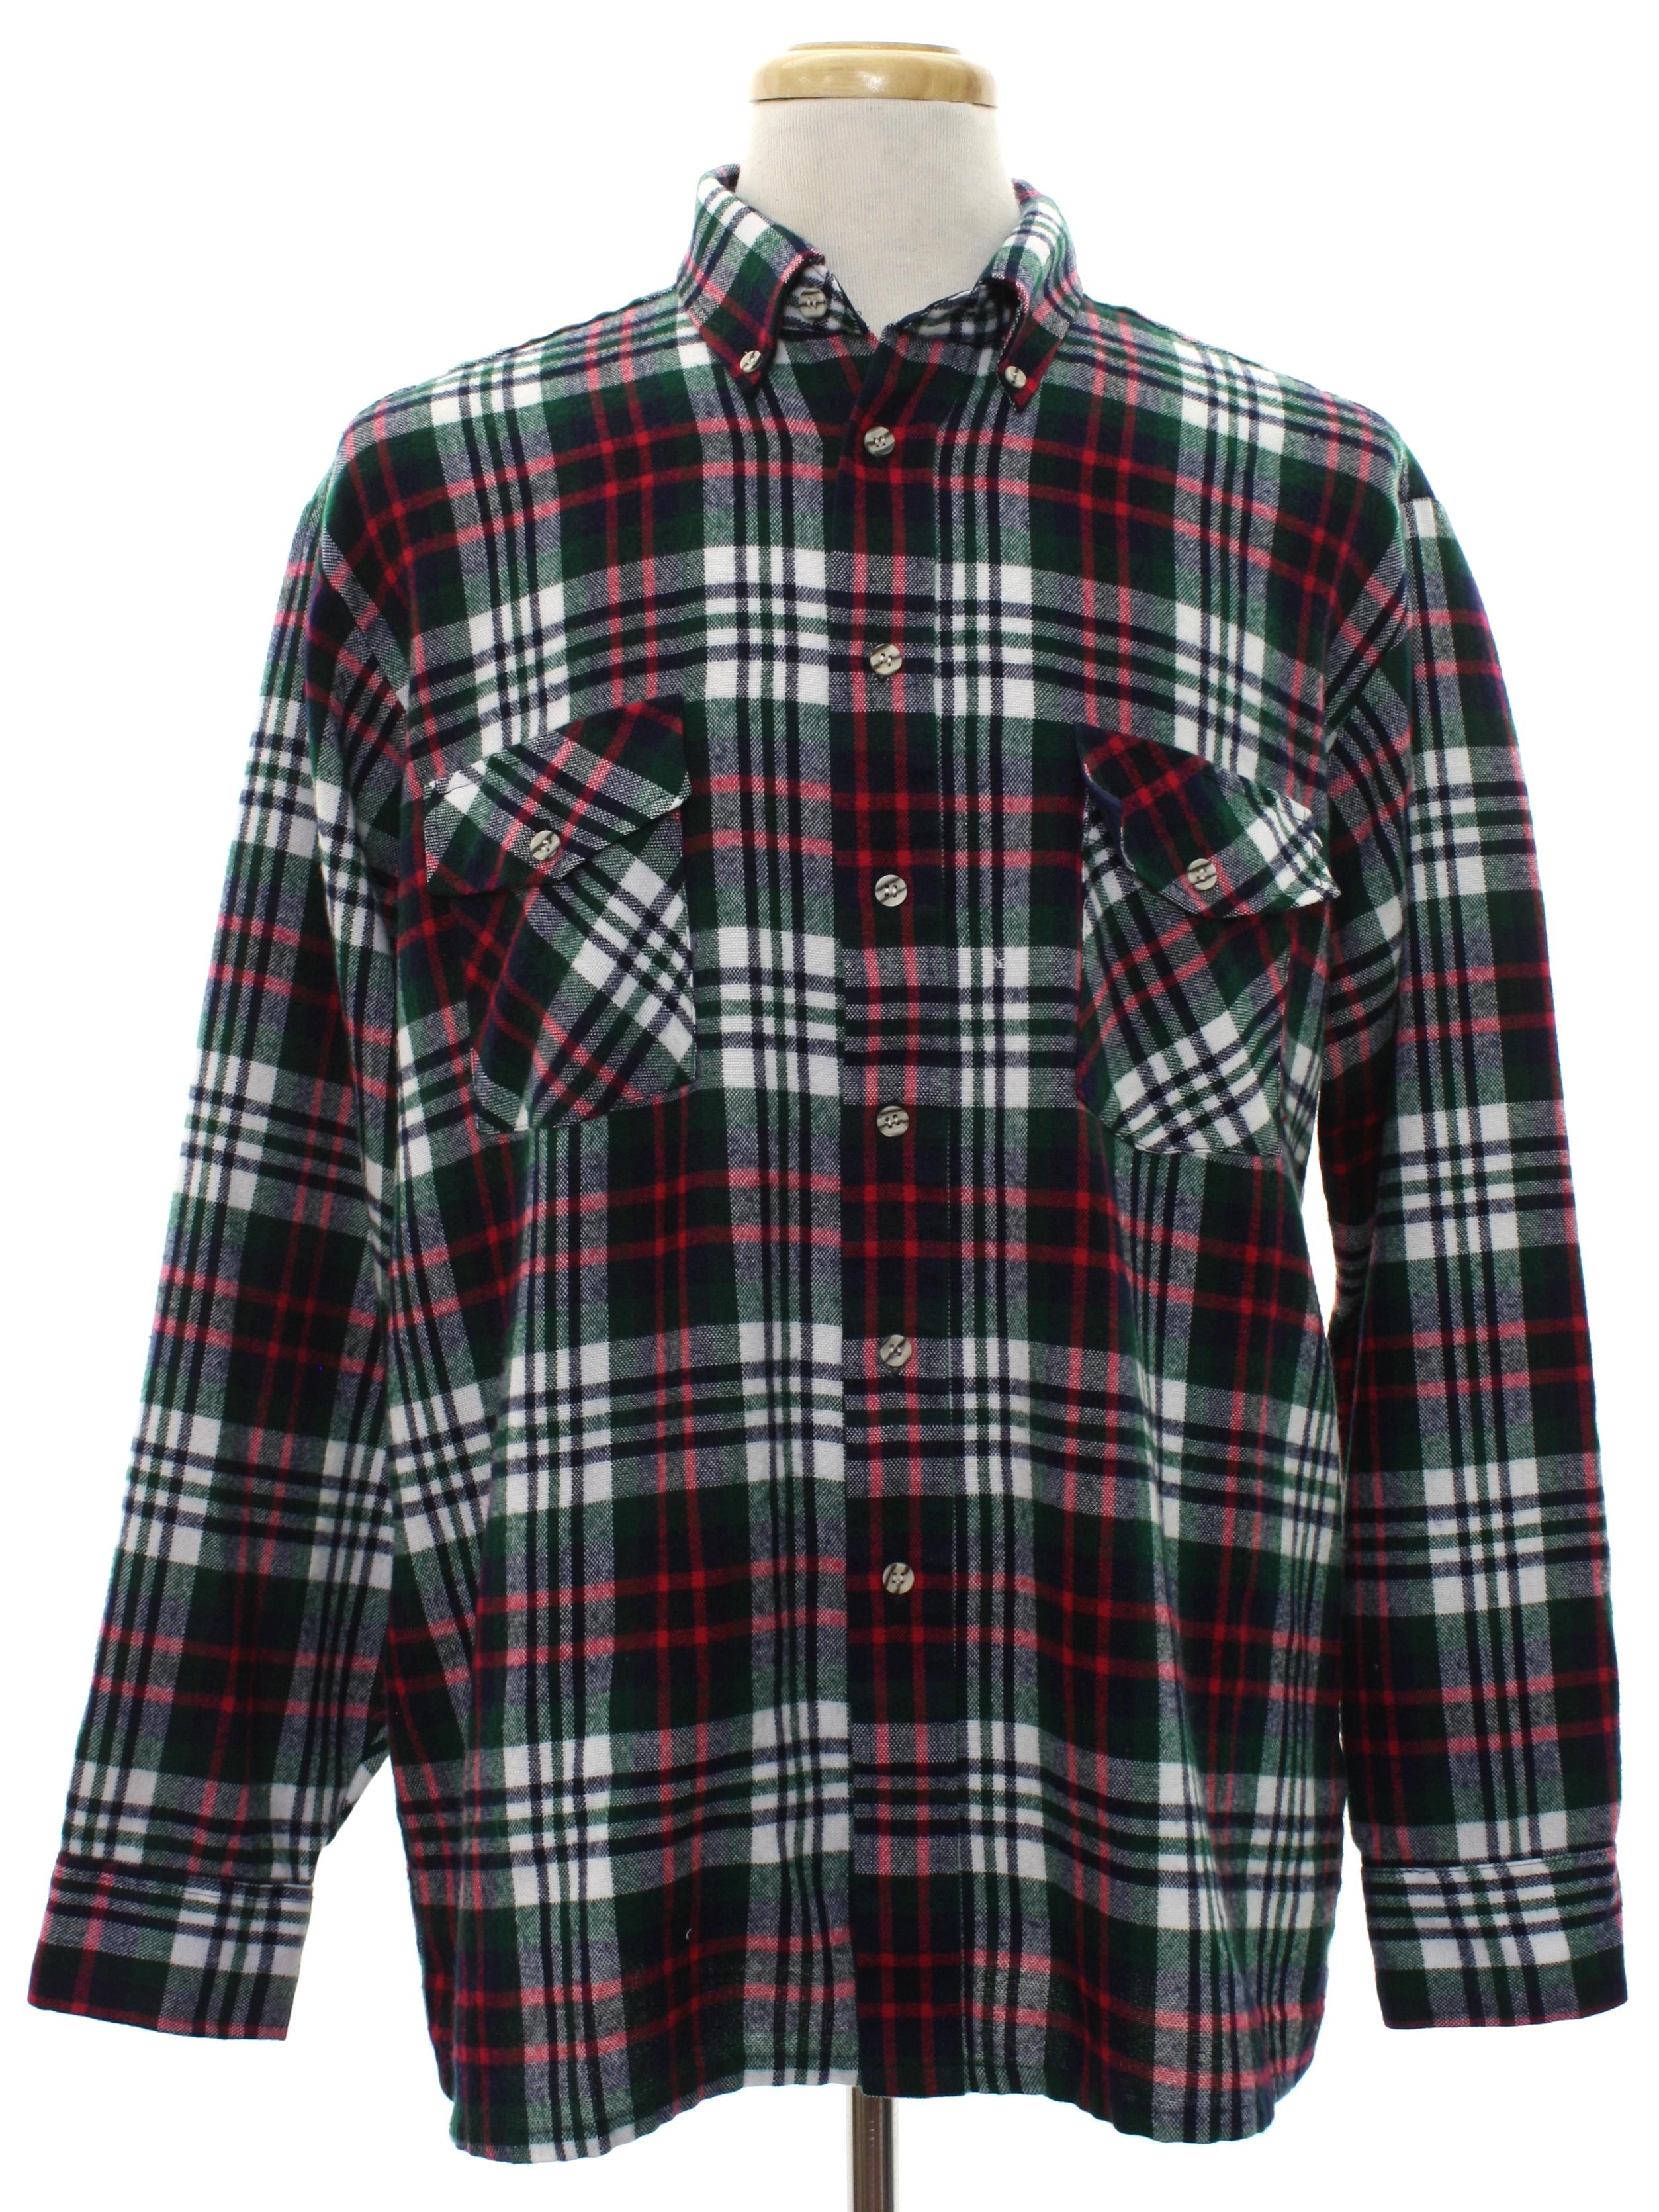 Retro 80s shirt winterweights by van heusen 80s for Van heusen plaid shirts